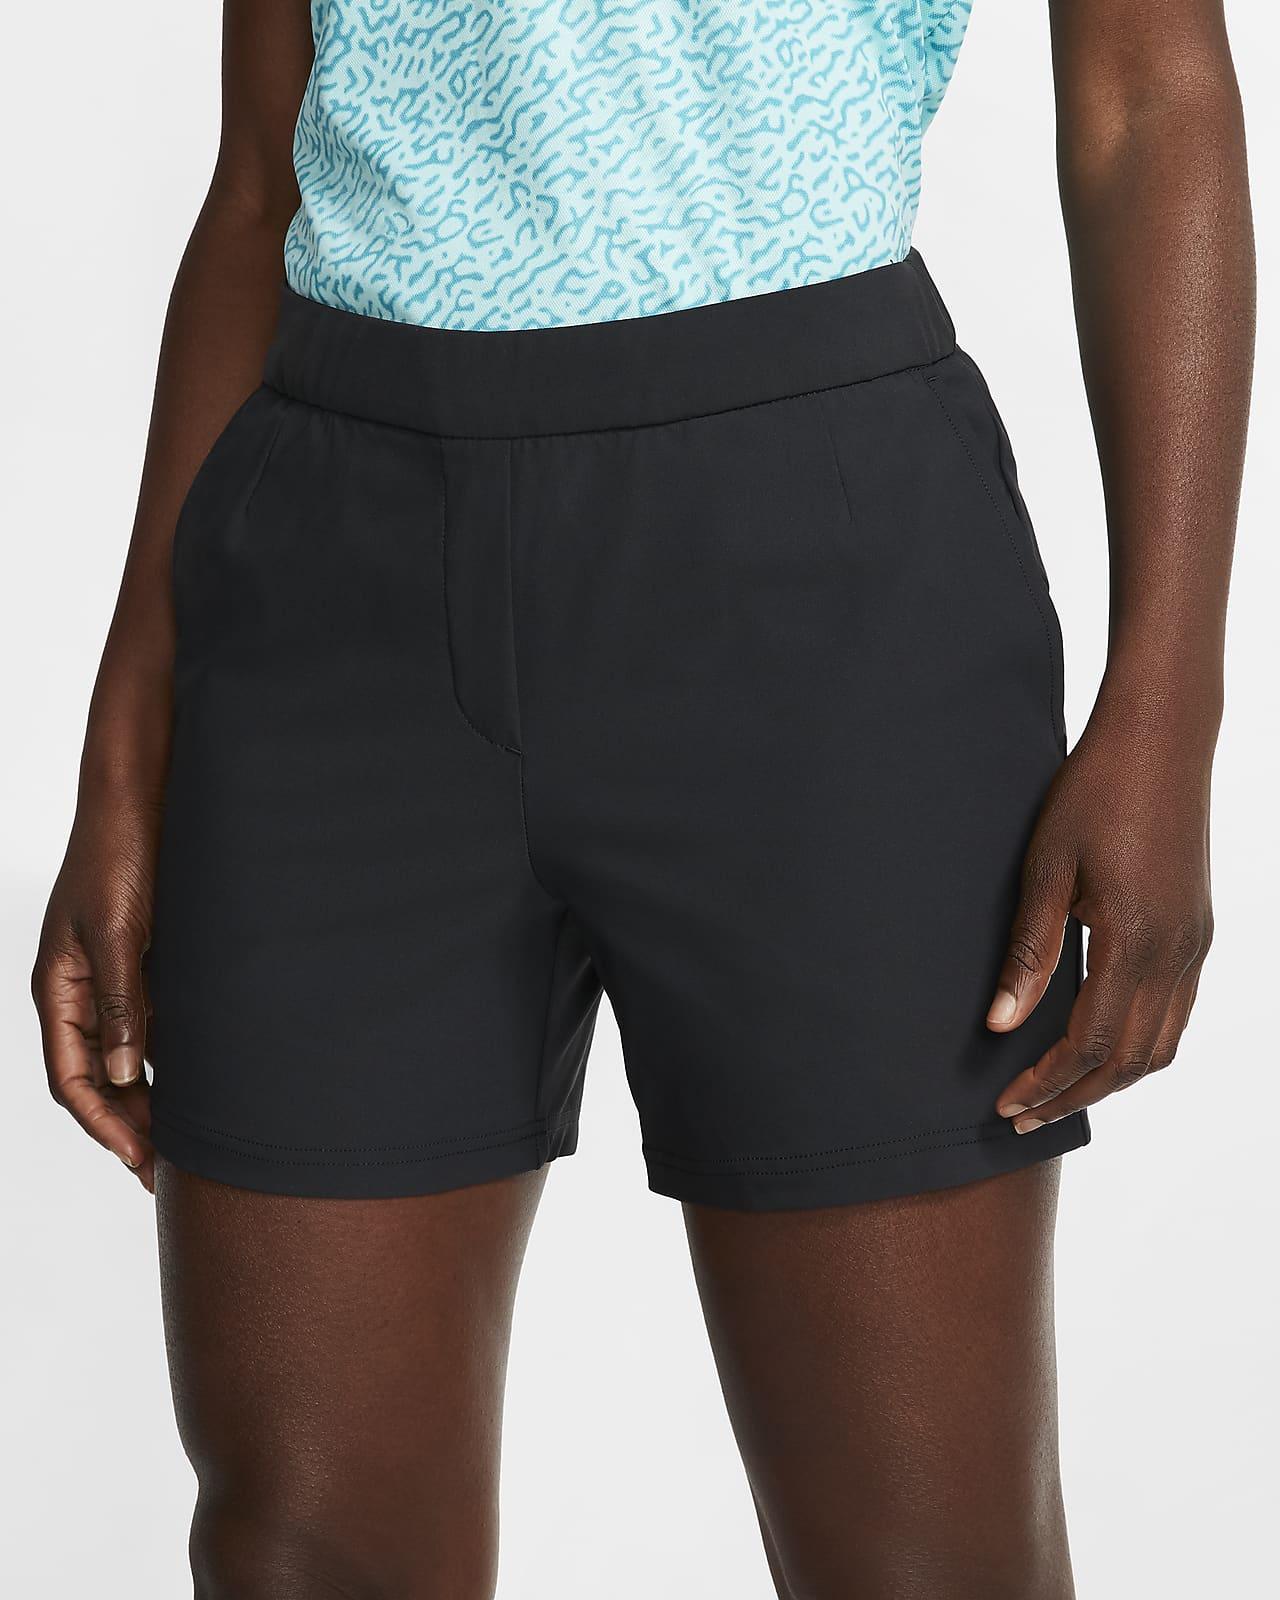 Nike Flex UV Victory golfshorts til dame (13 cm)